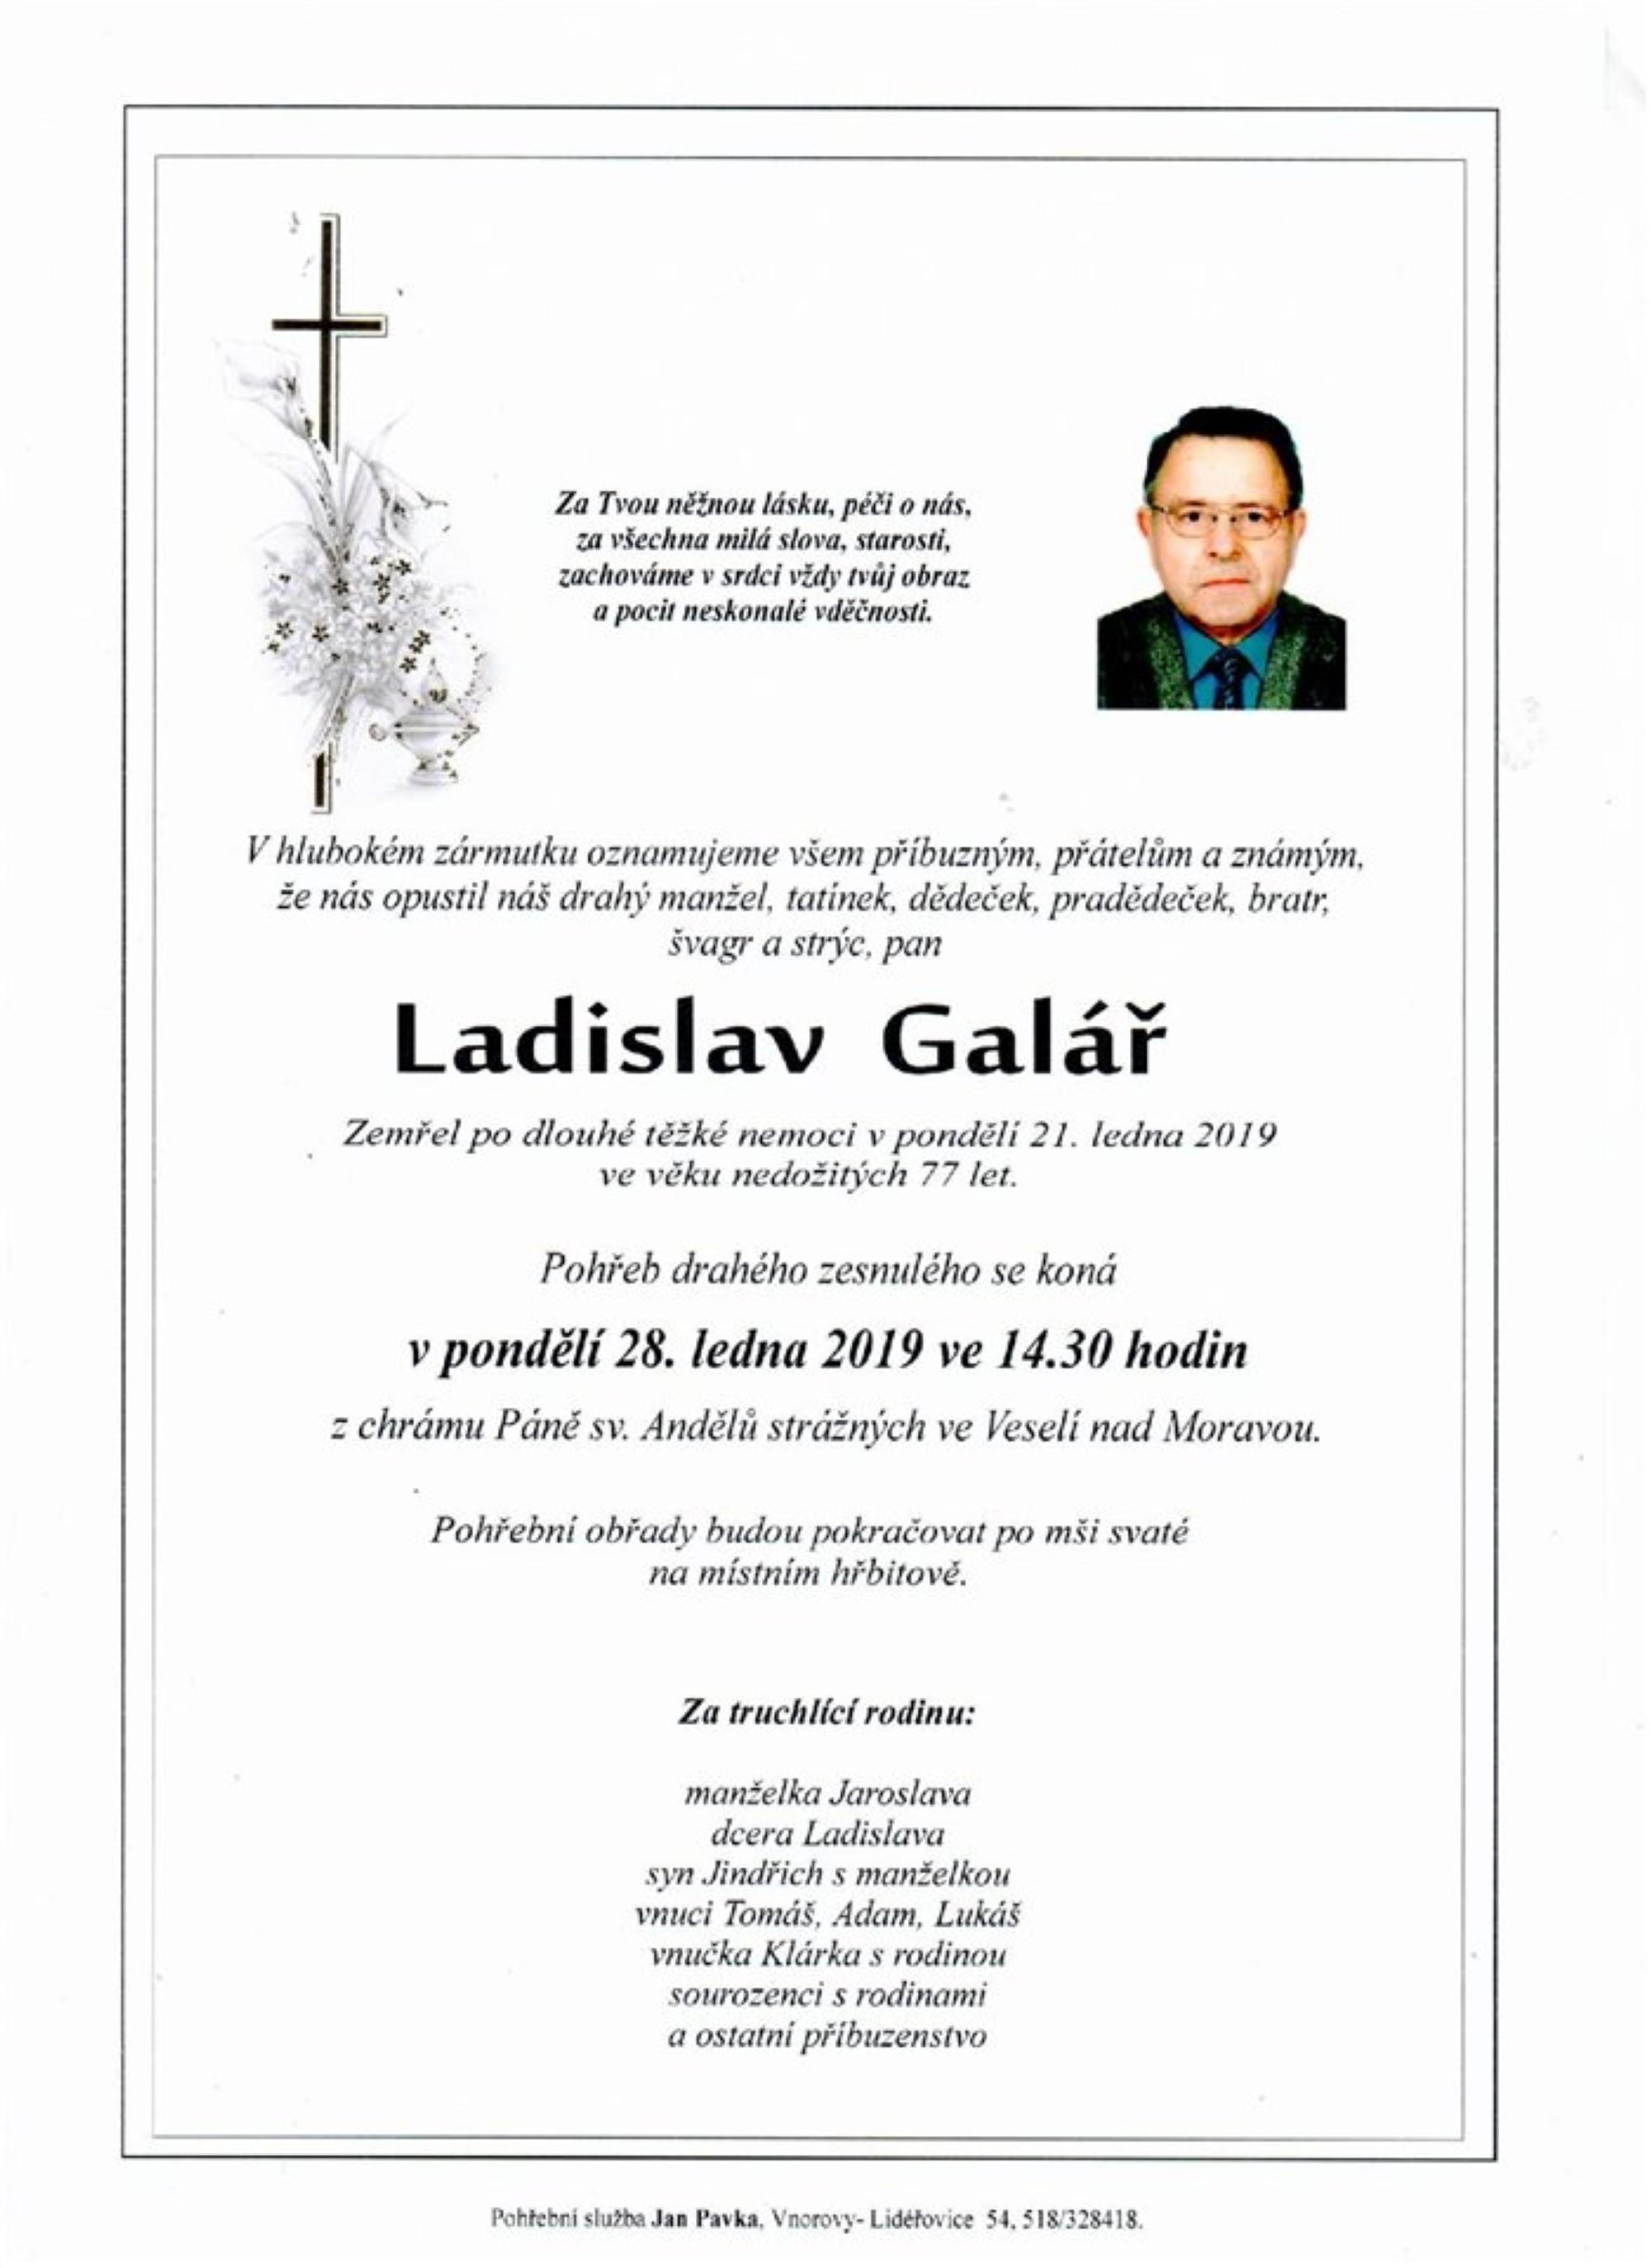 Ladislav Galář